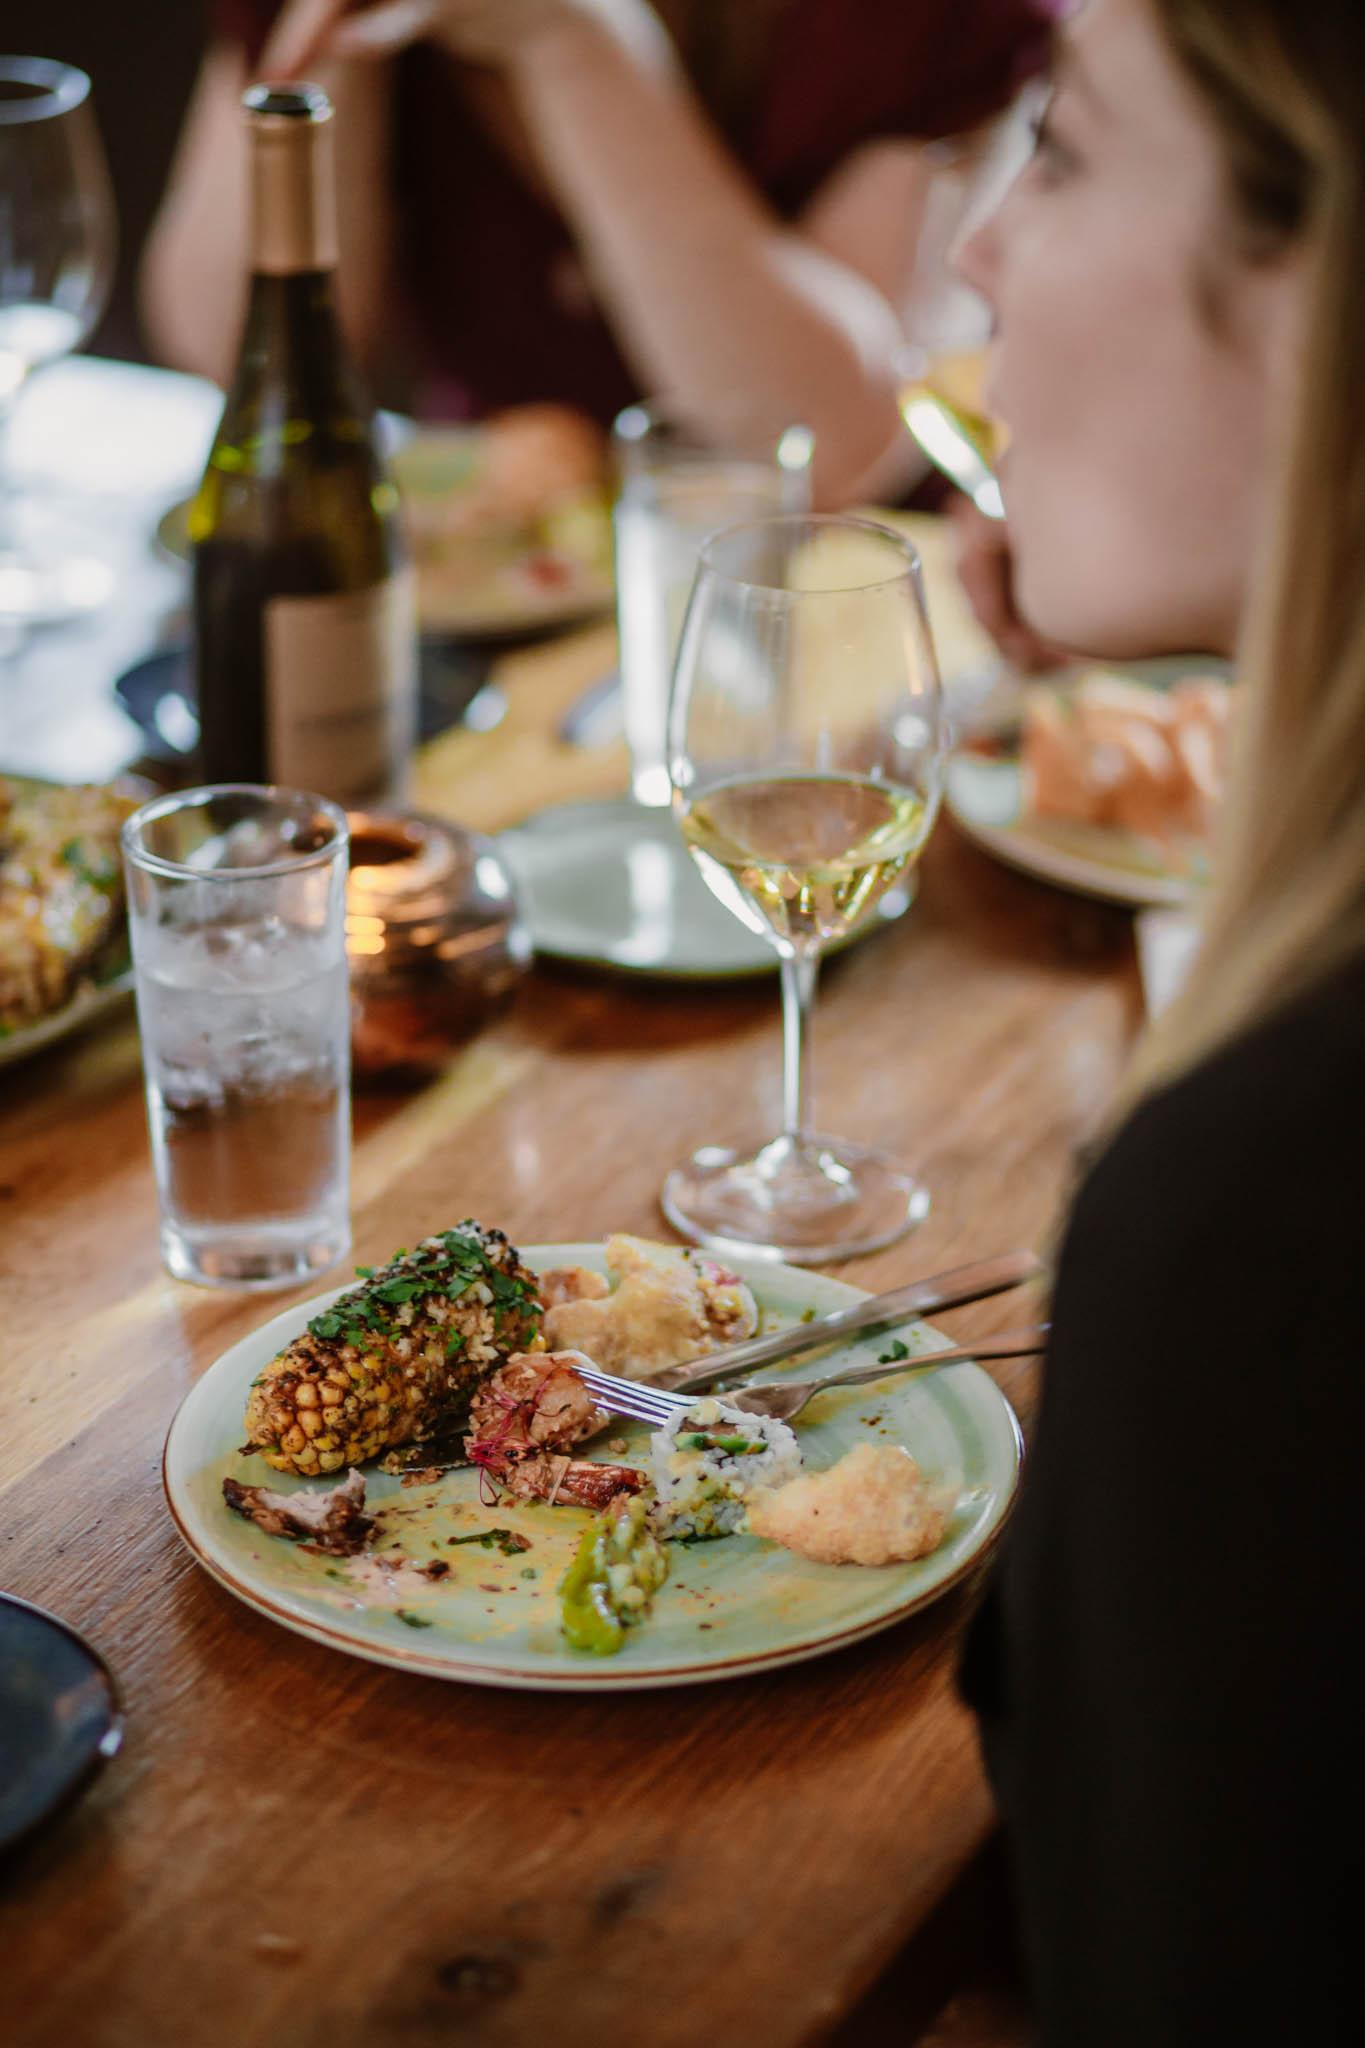 Charlottesville-Editorial-food-photographer_028.jpg